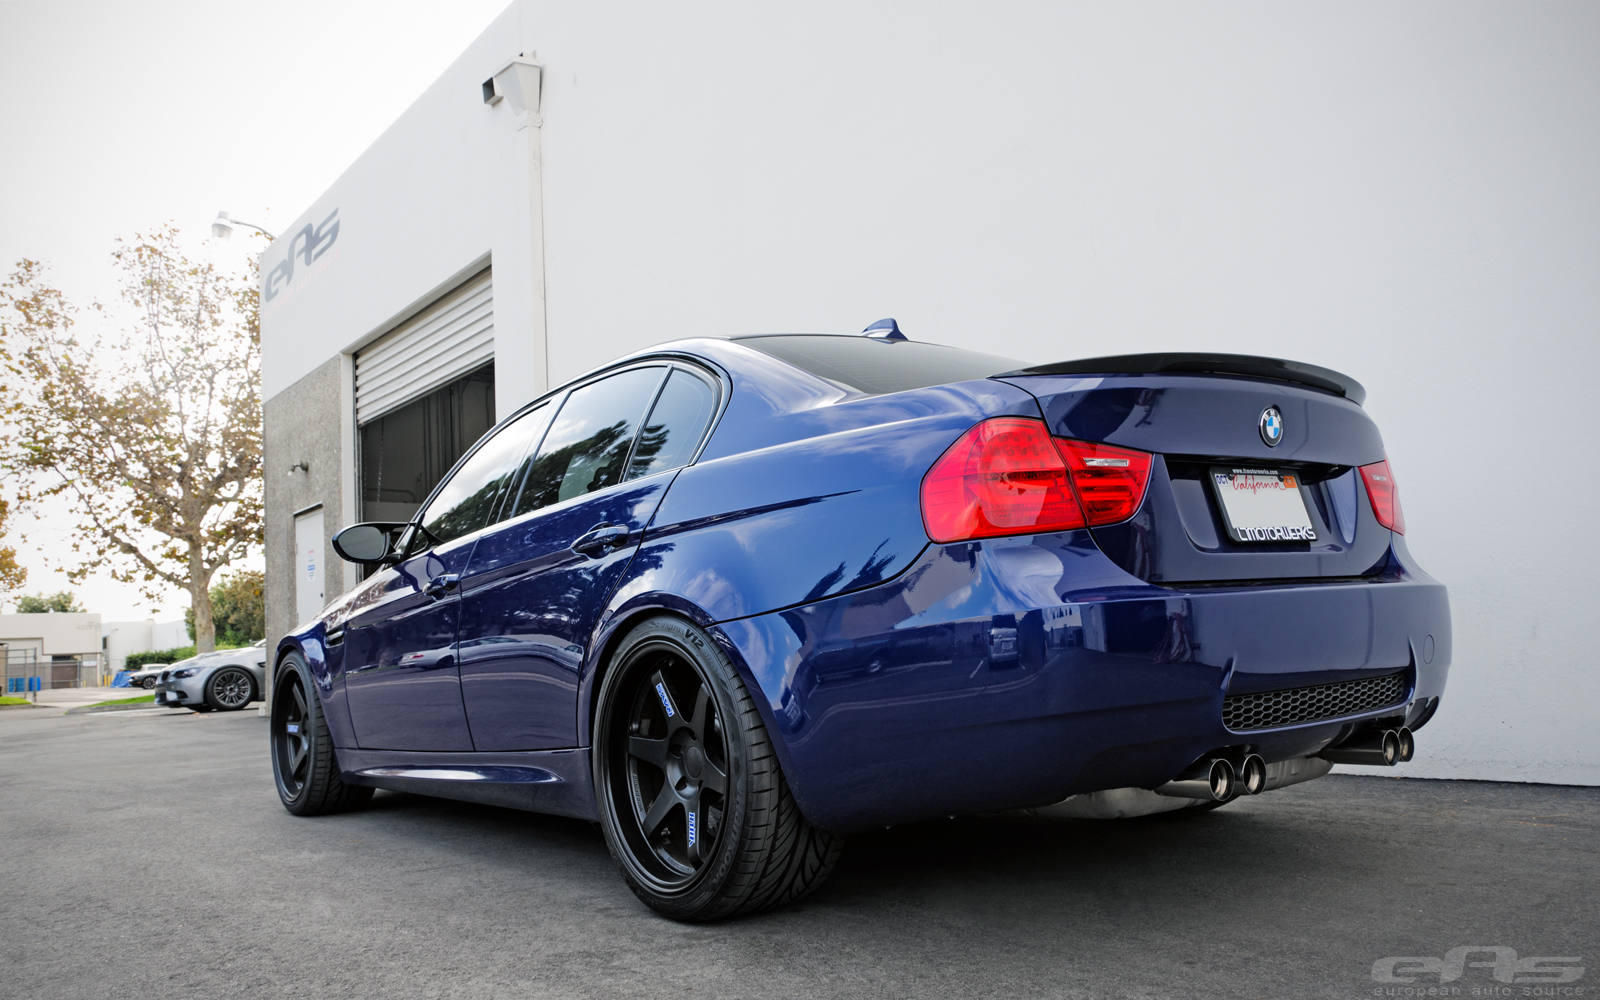 Interlagos Blue Bmw E90 M3 Looks Stunning On Volk Wheels